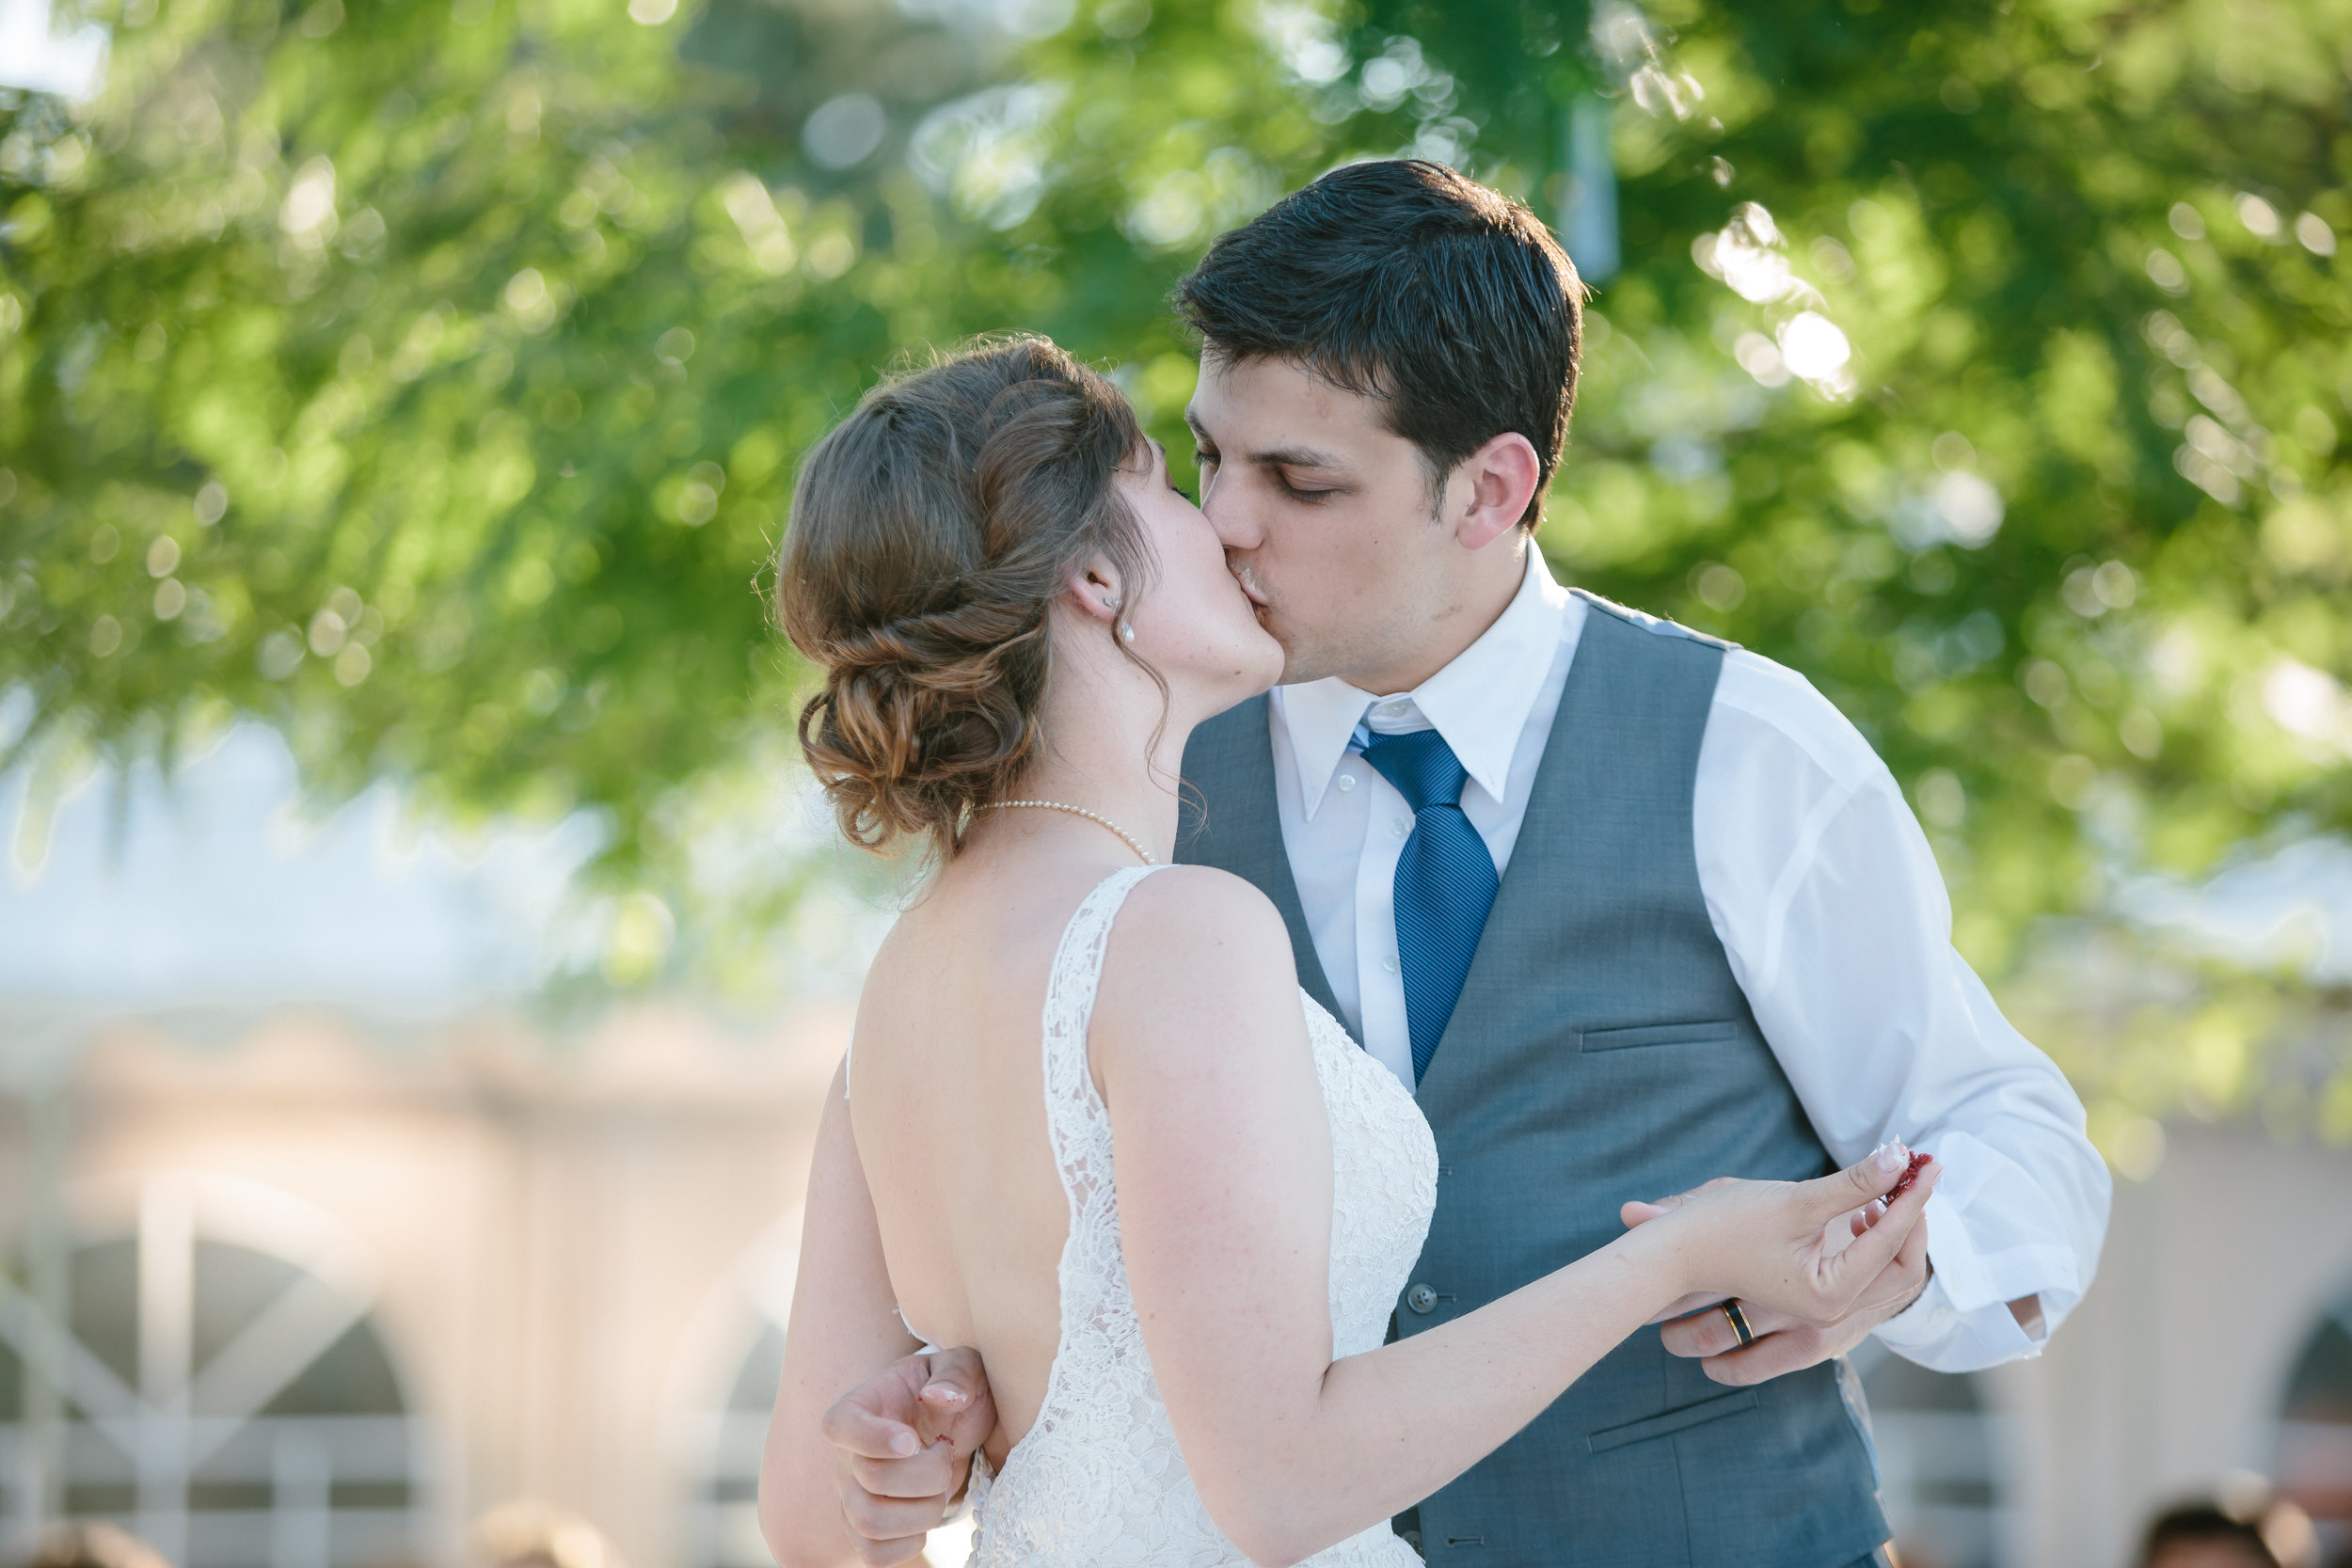 Jordan & Shantel Married - Idaho - Corrie Mick Photography-290.jpg